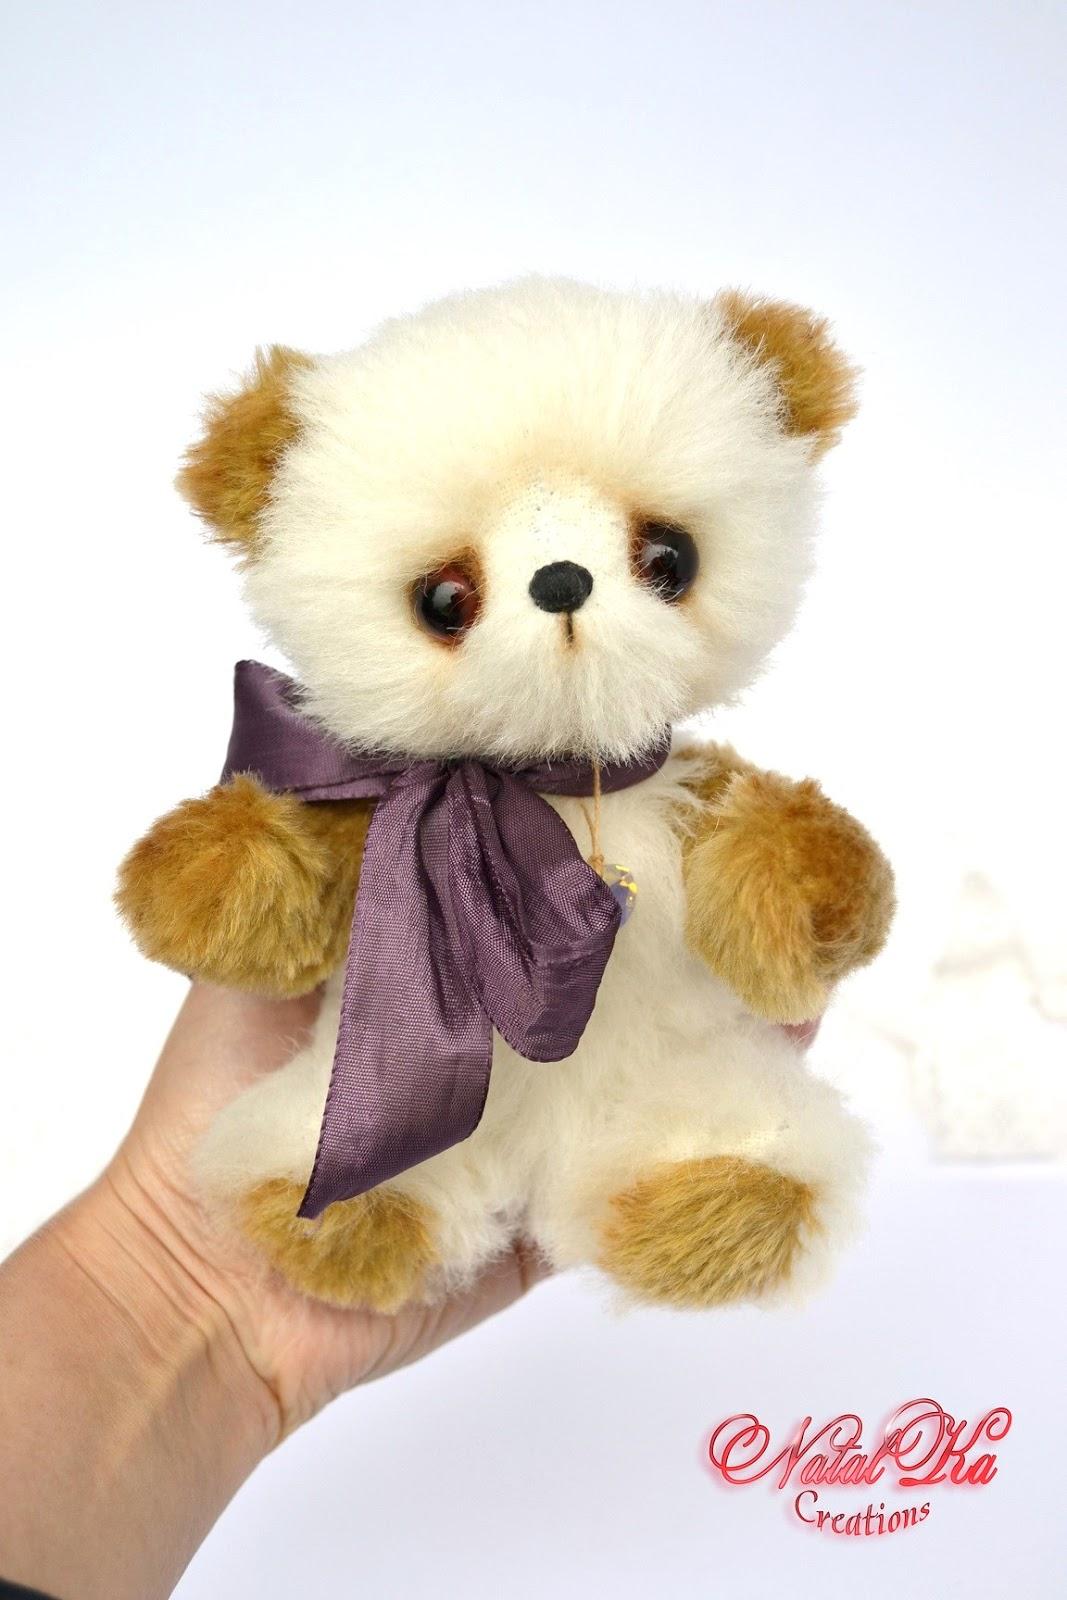 Künstlerbär, Teddybär, Künstlerteddybär, Teddy aus Mohair von NatalKa Creations. Artist teddy bear, teddies, teddy bear, mohair, ooak, handmade by NatalKa Creations